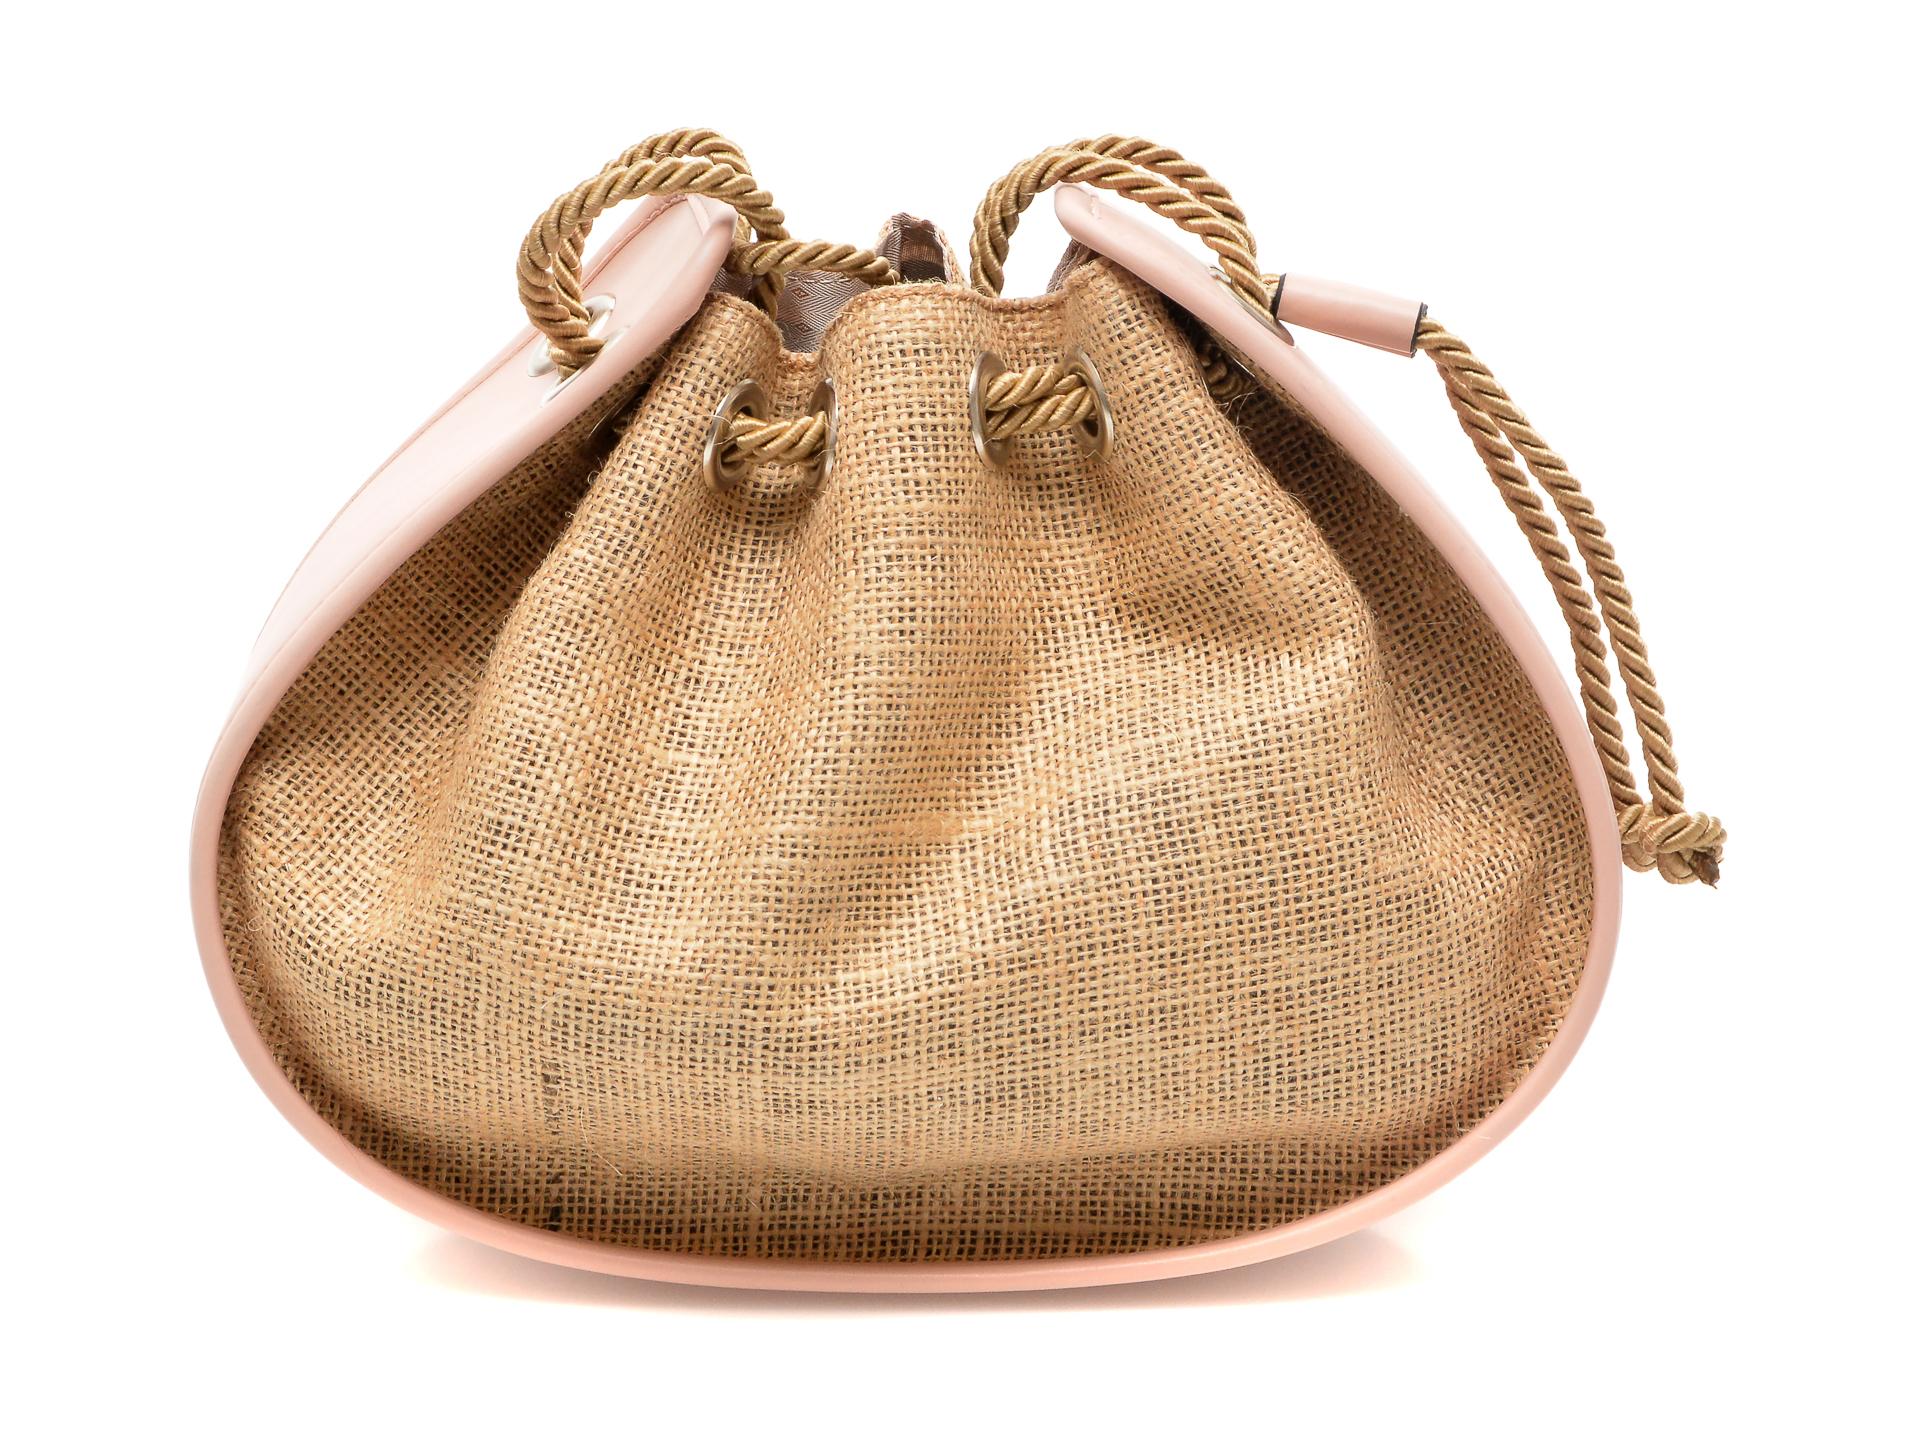 Poseta FLAVIA PASSINI nude, OZN, din material textil si piele ecologica